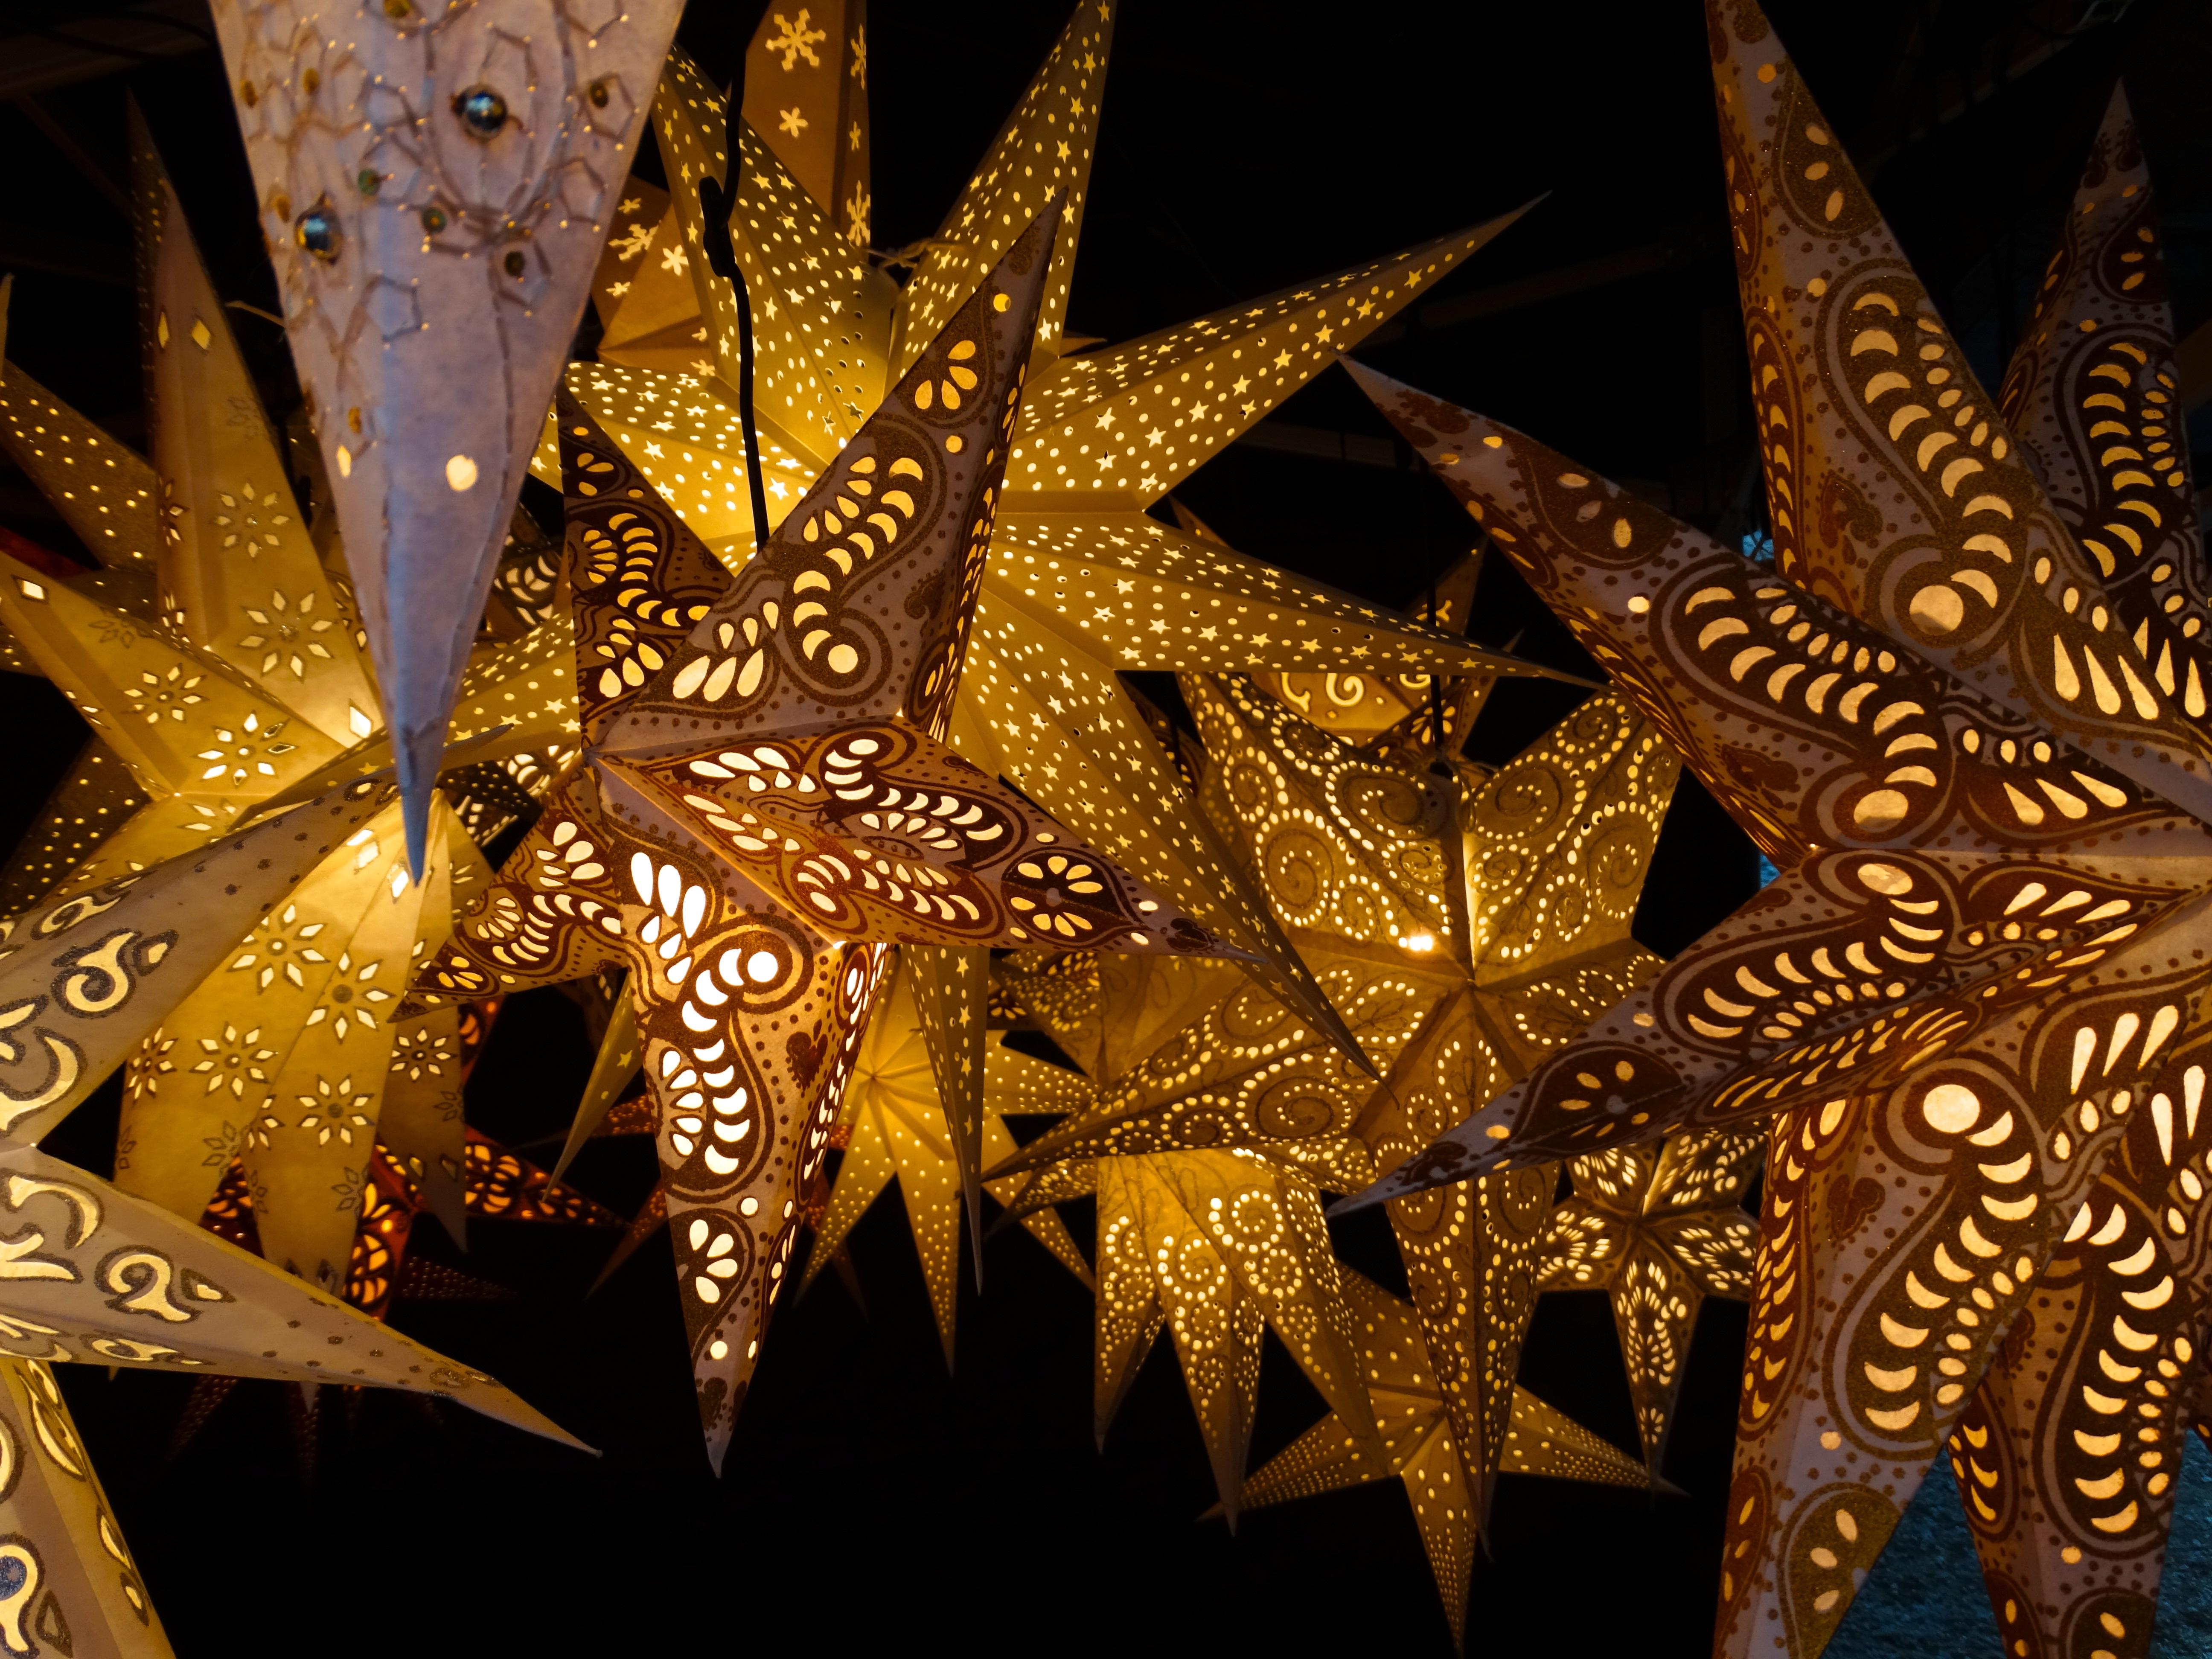 star decoration christmas christmas decoration symmetry christmas lights fractal art luminous stars